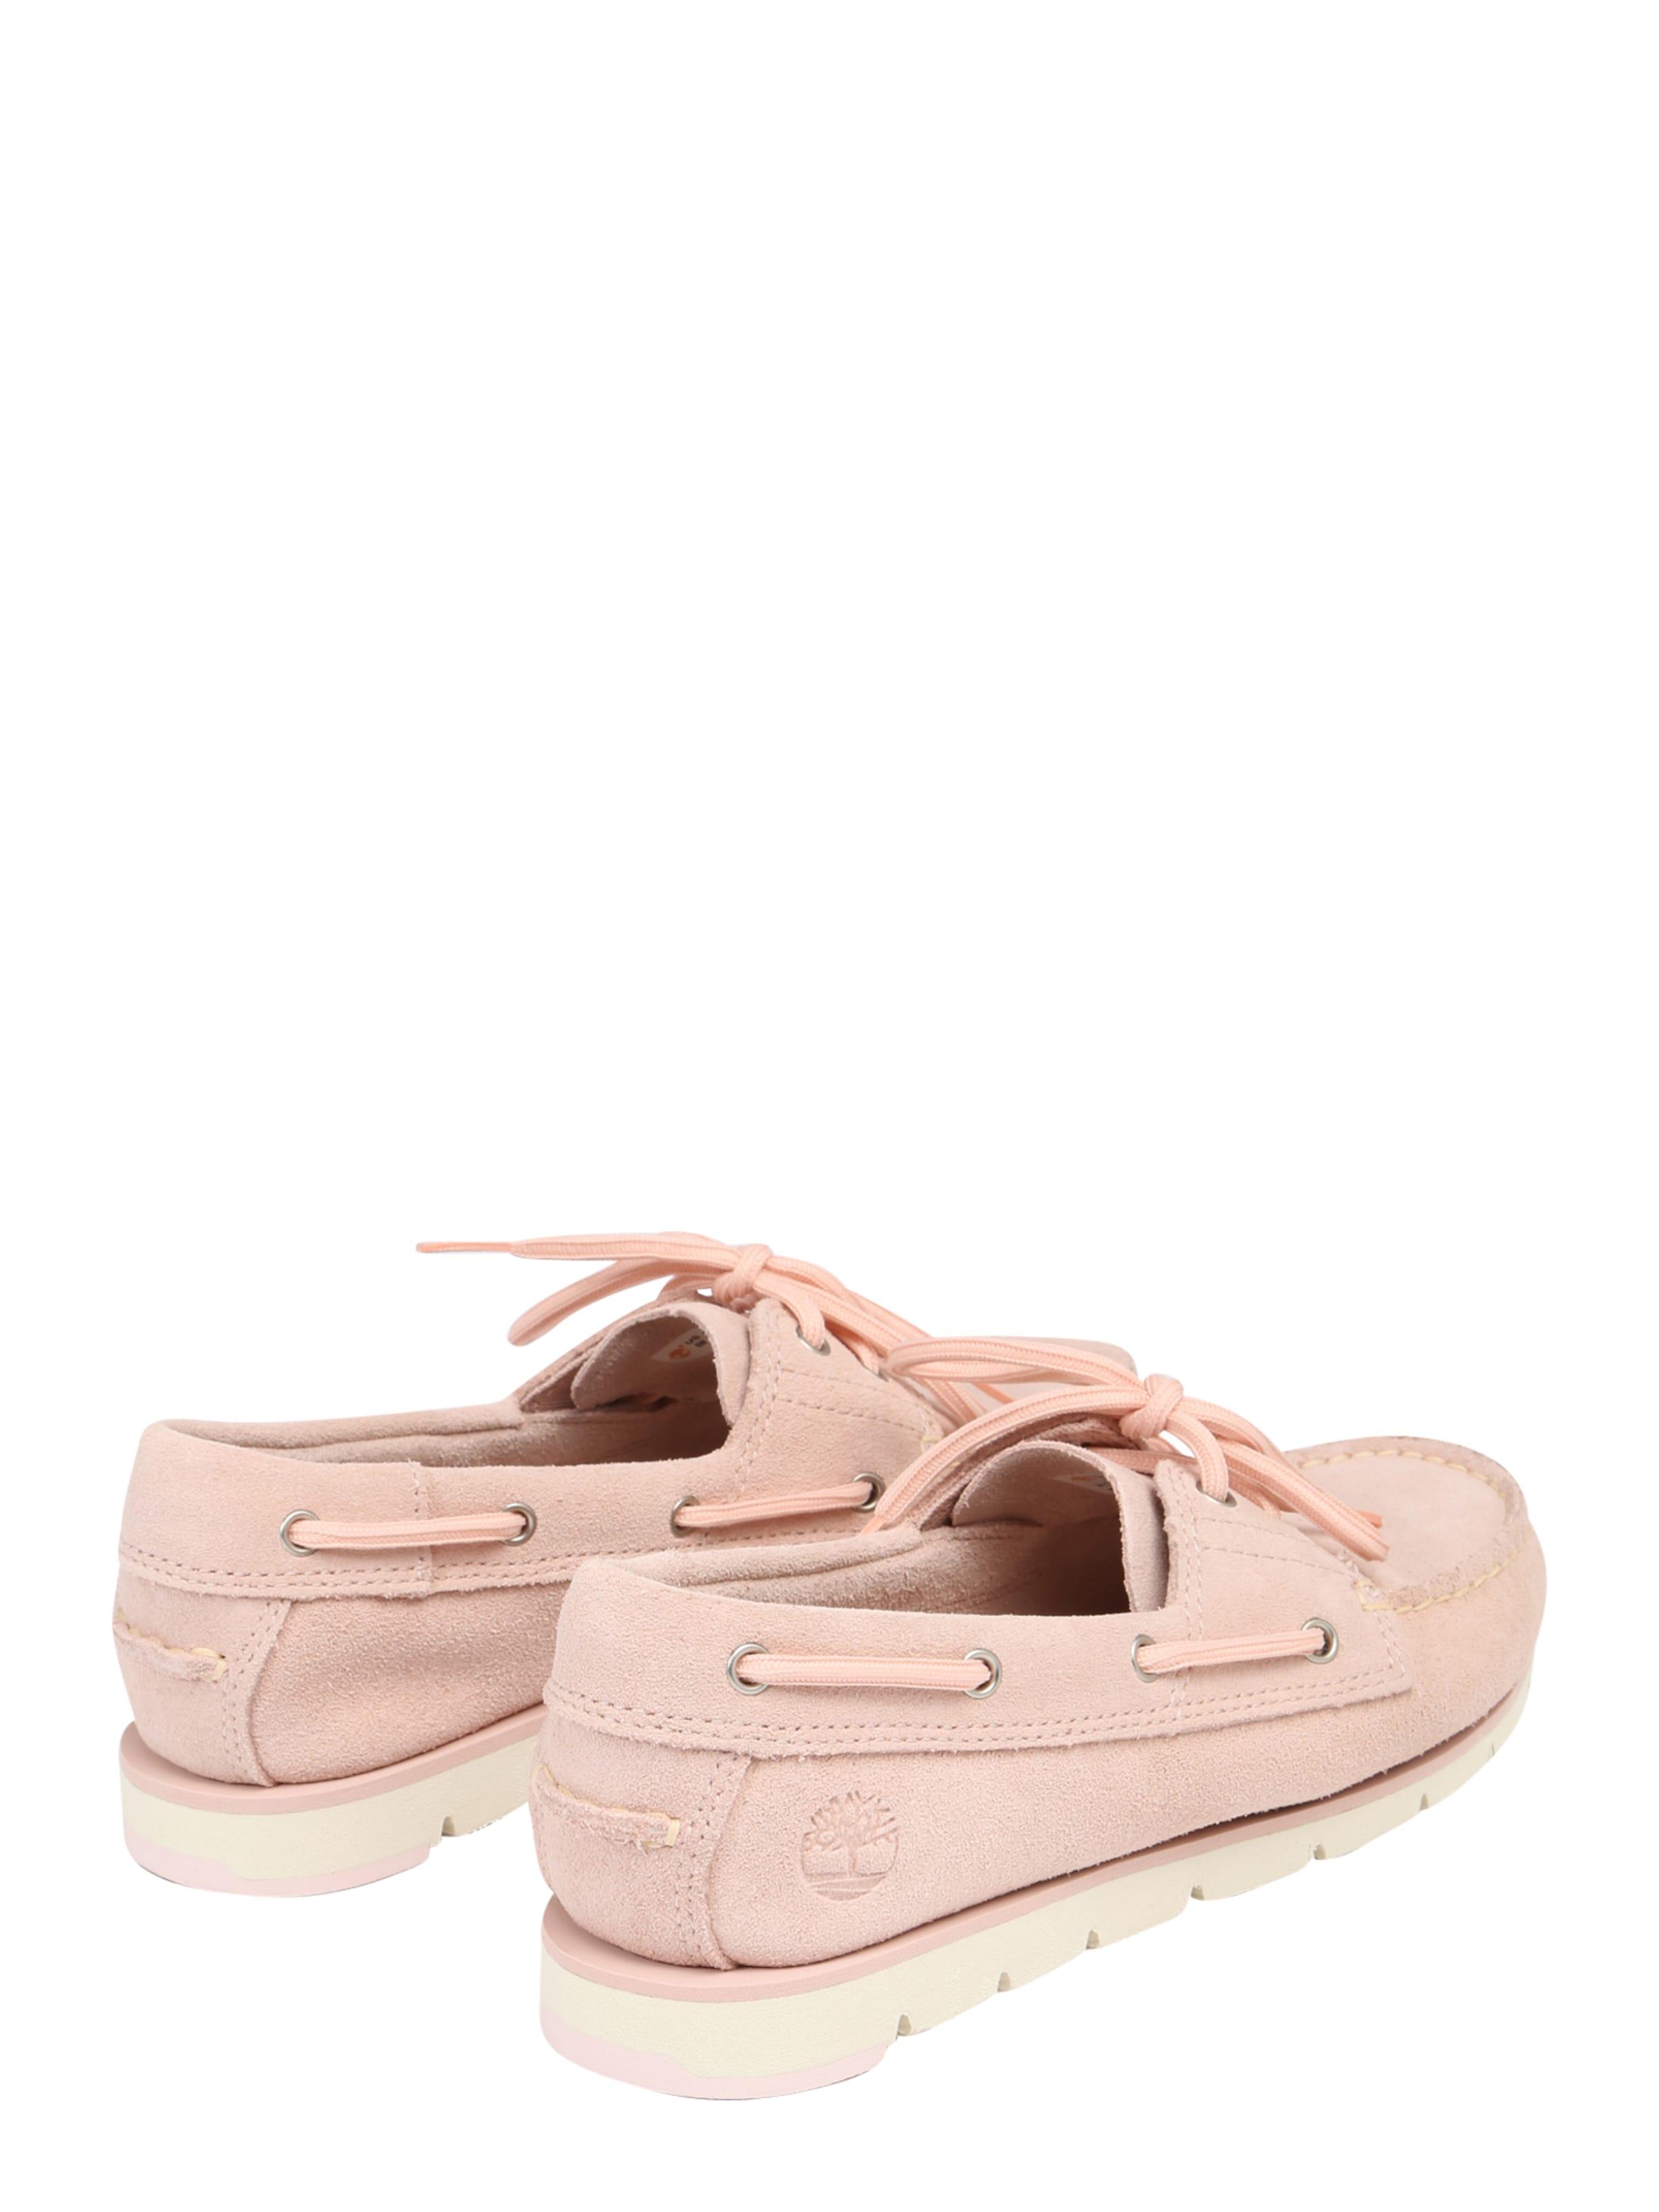 Chaussures De Sport Haut Durden Gauche Colmar Noir